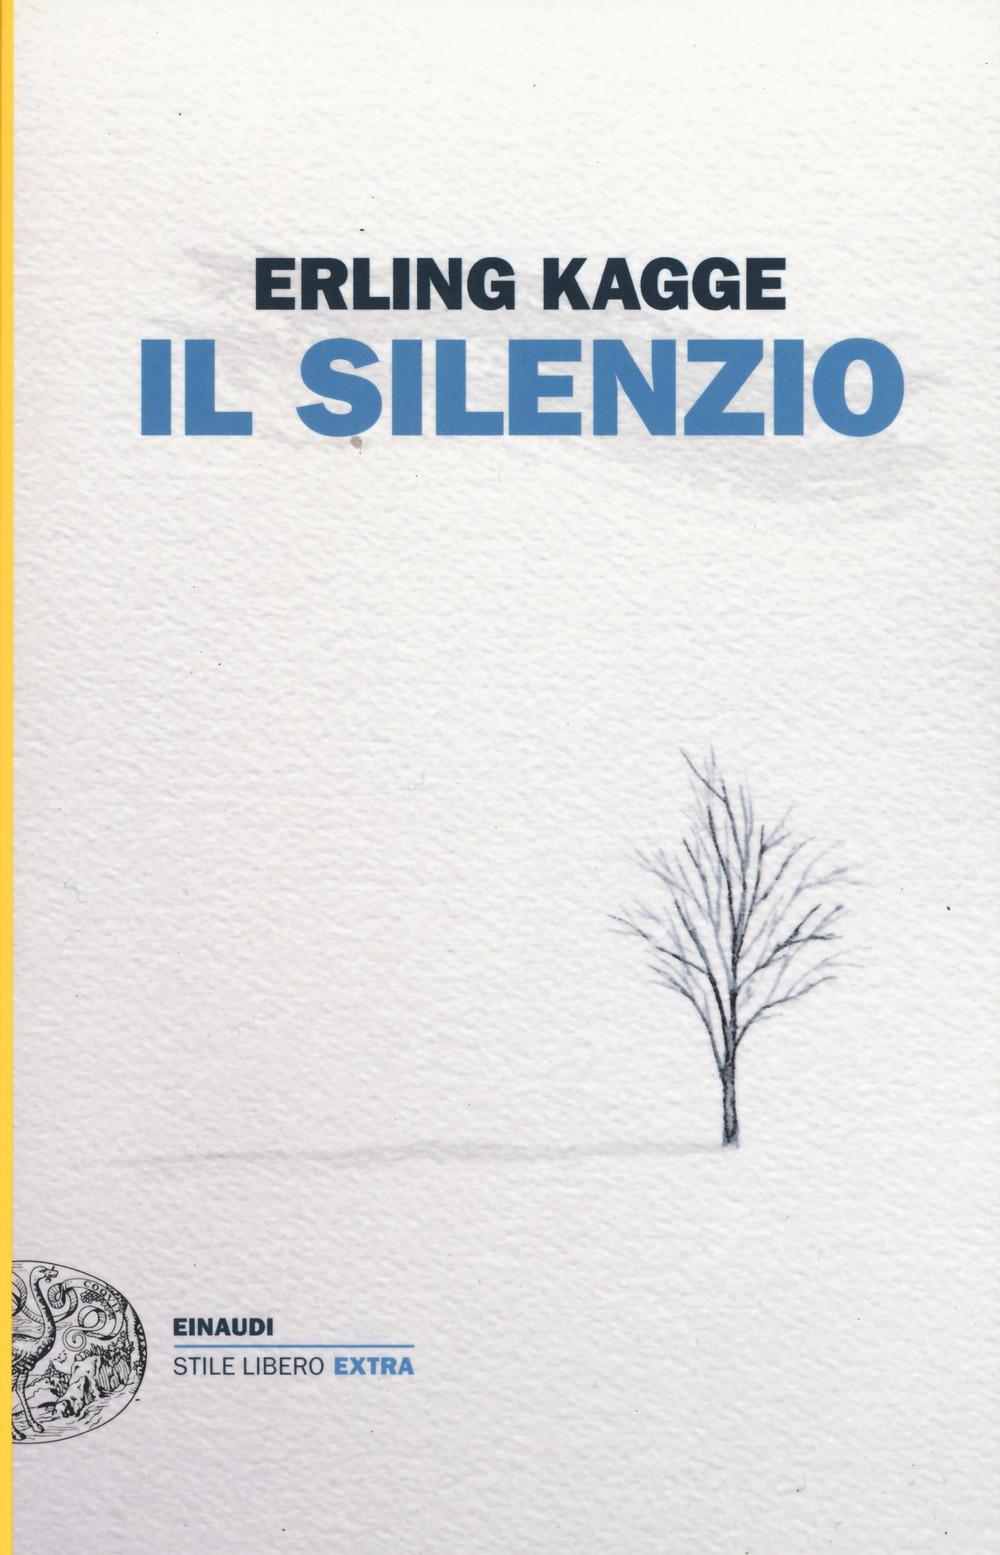 Il silenzio, Erling Kagge, Einaudi